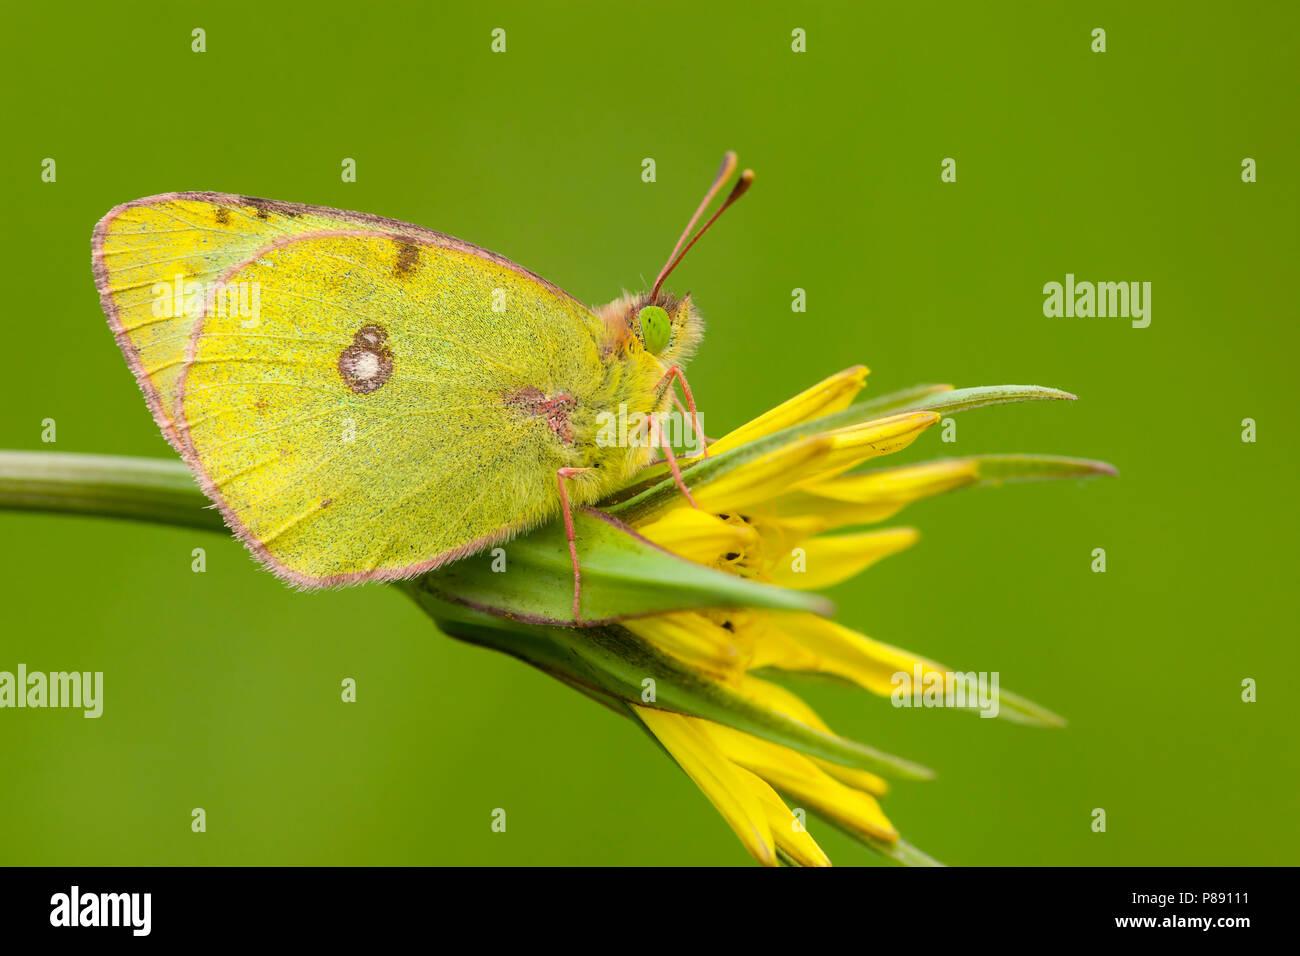 Zuidelijke luzernevlinder / Berger's Clouded Yellow (Colias alfacariensis) Stock Photo